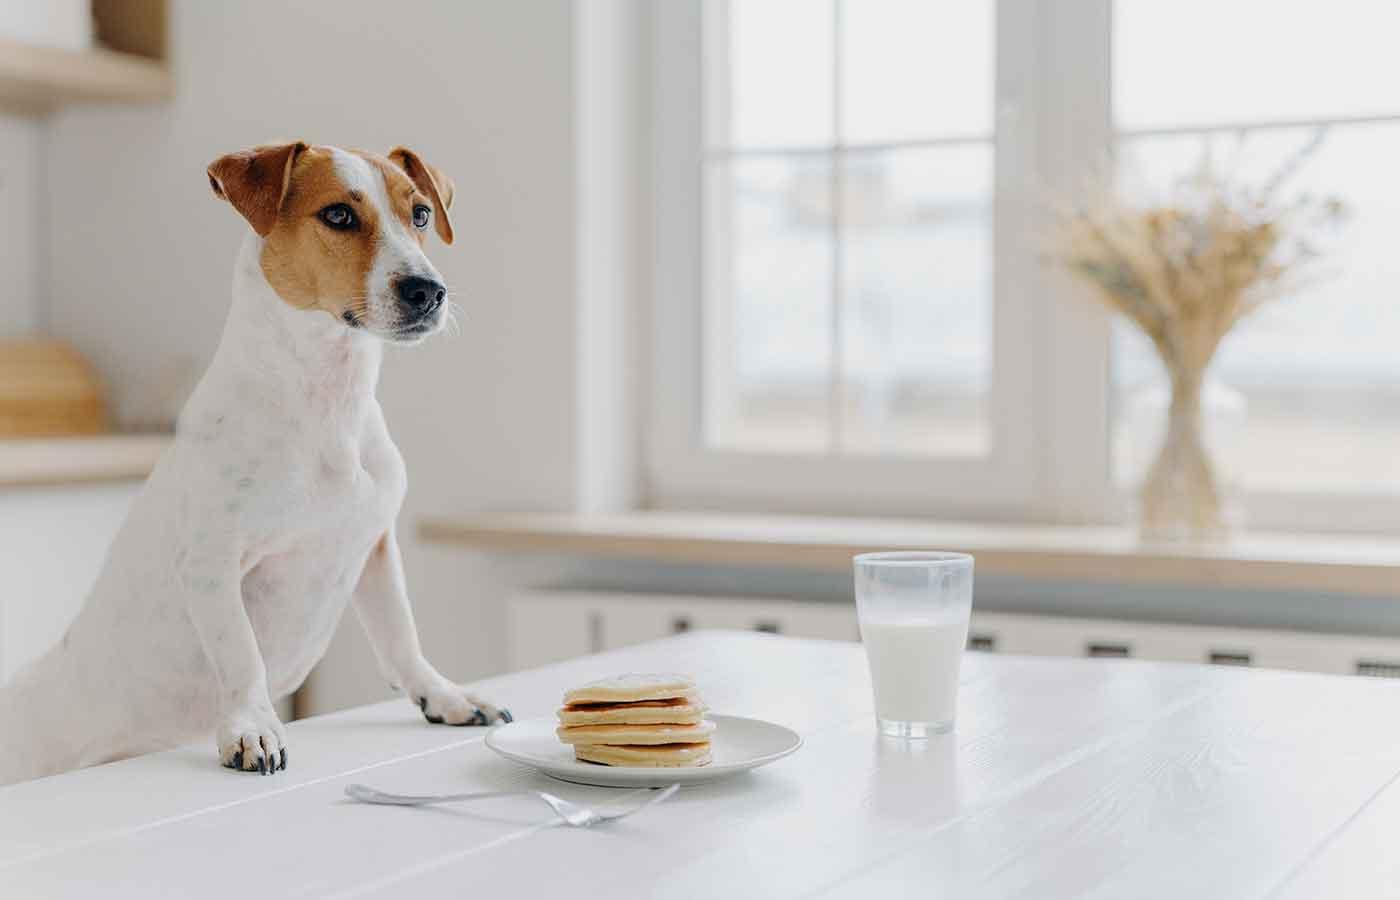 Leche queda prohibida para perros